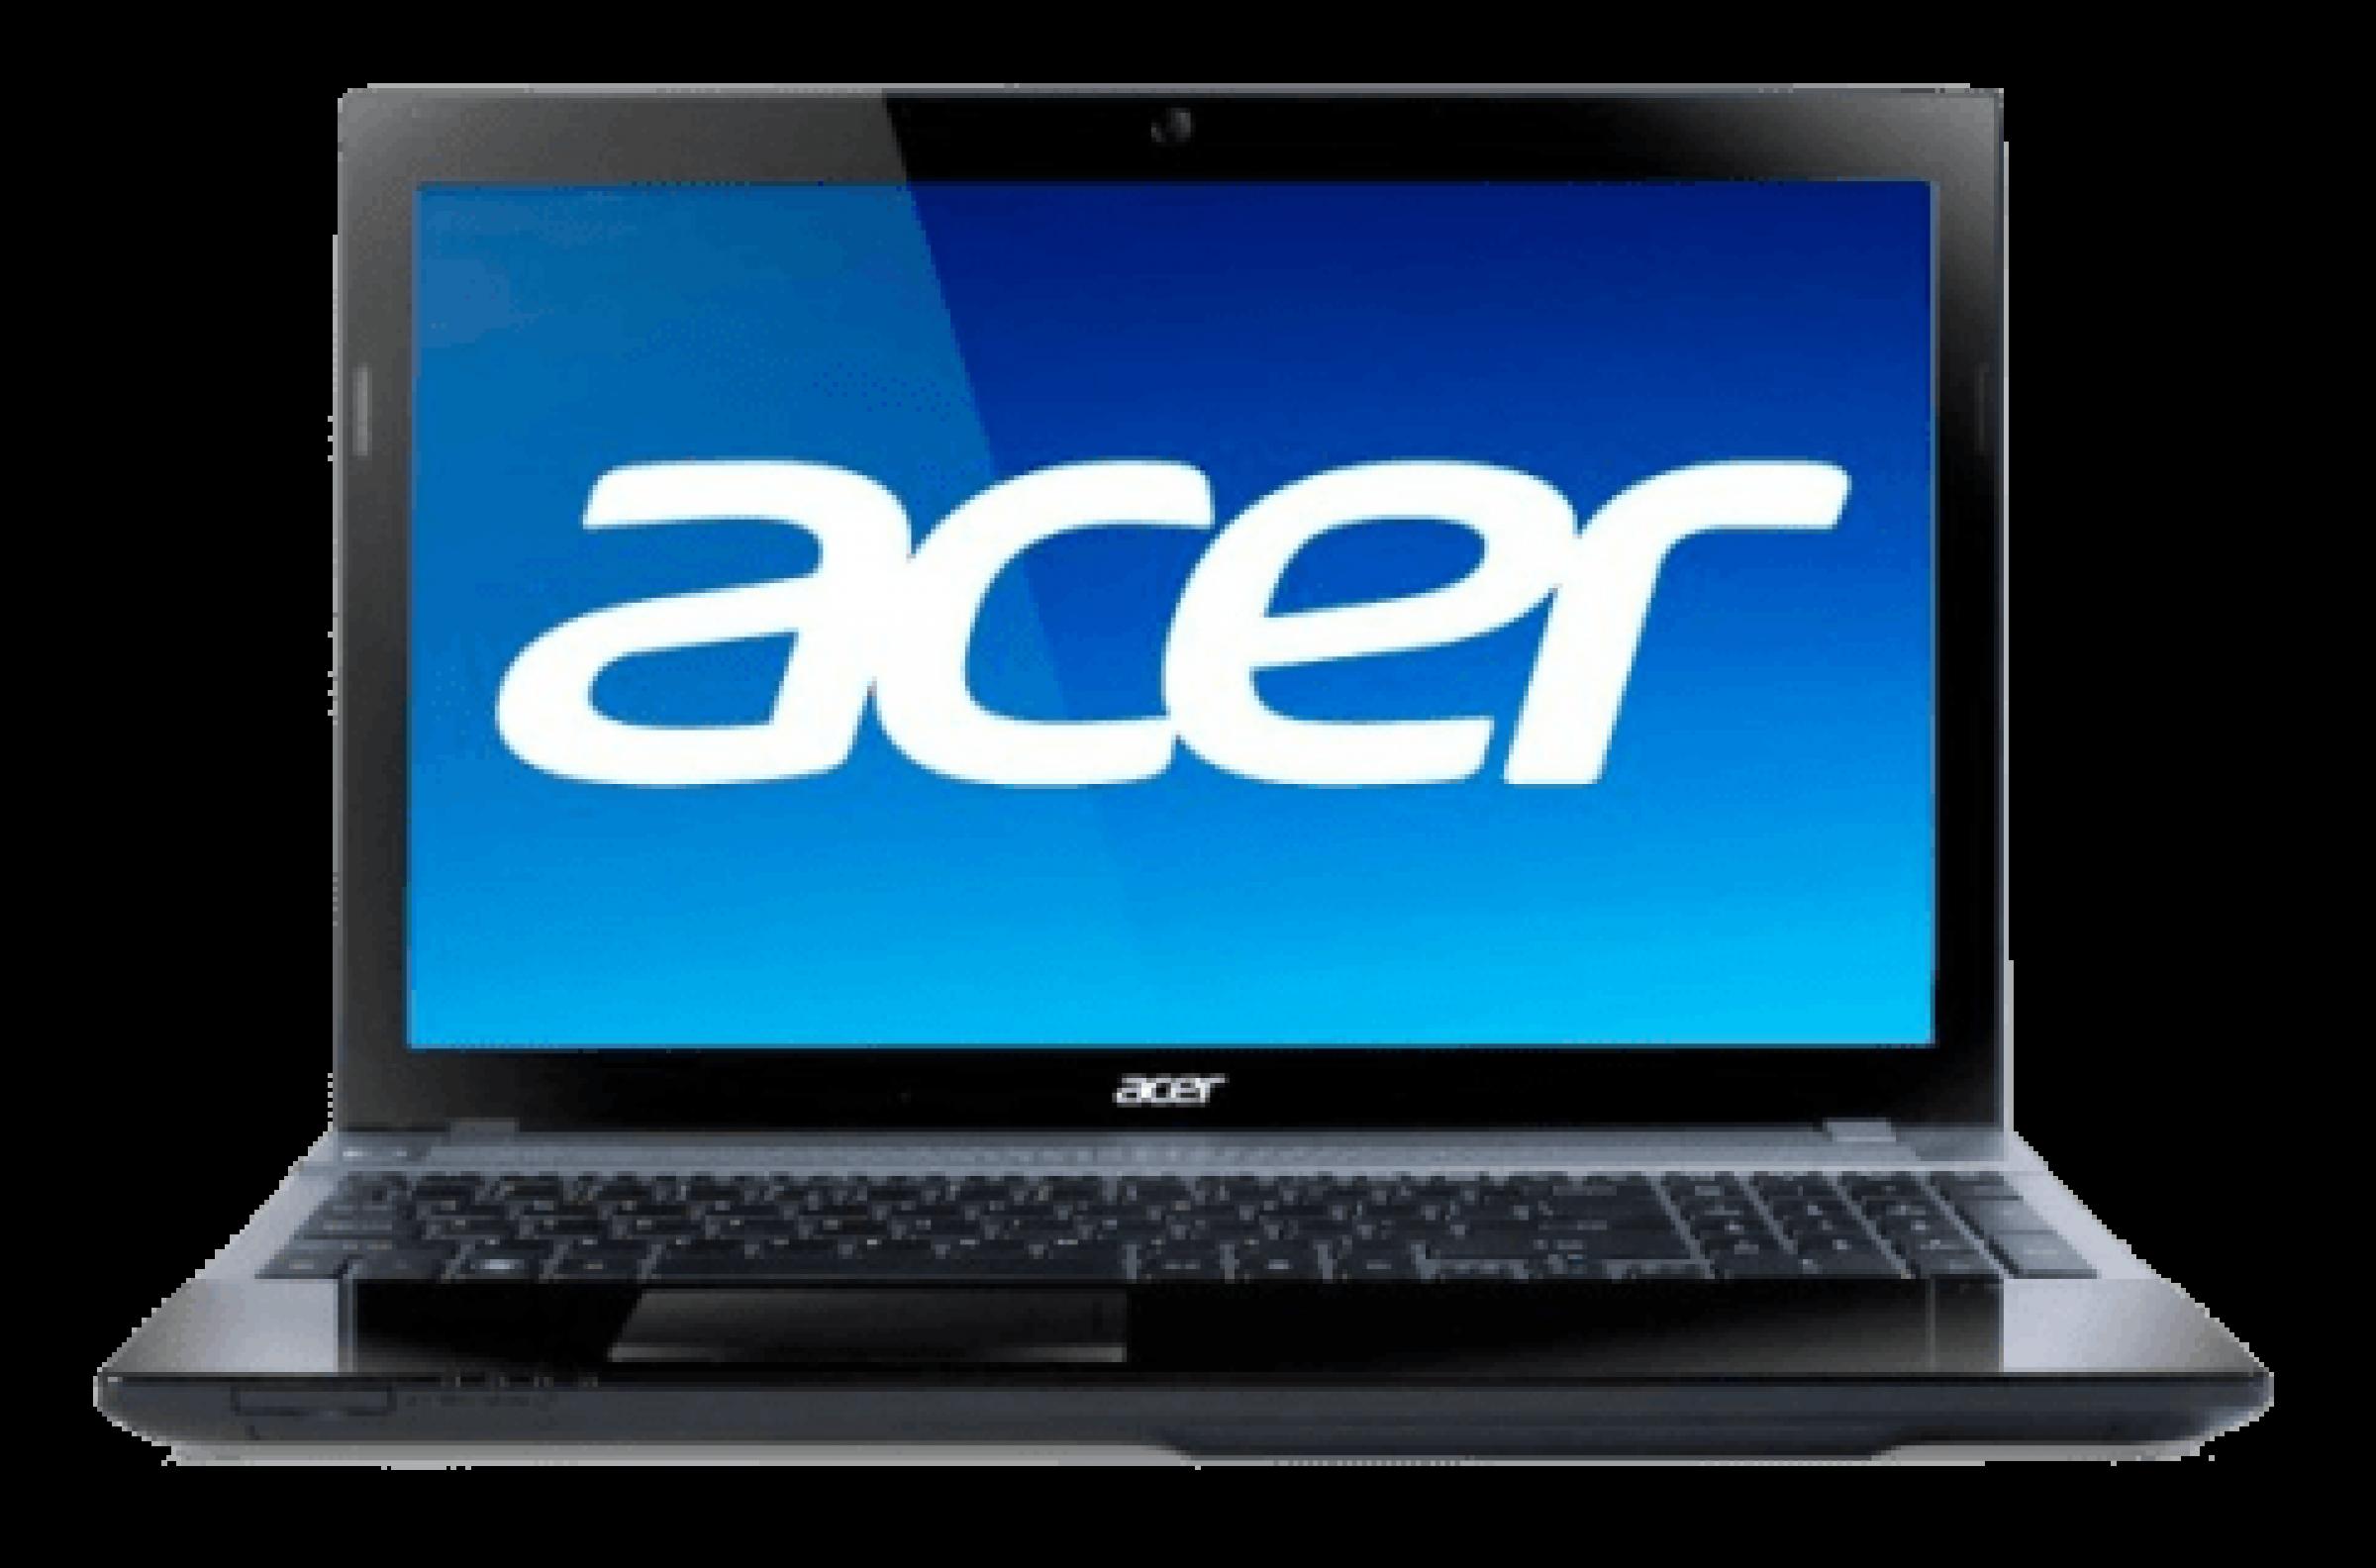 Acer Desktop PC and Laptop Computers